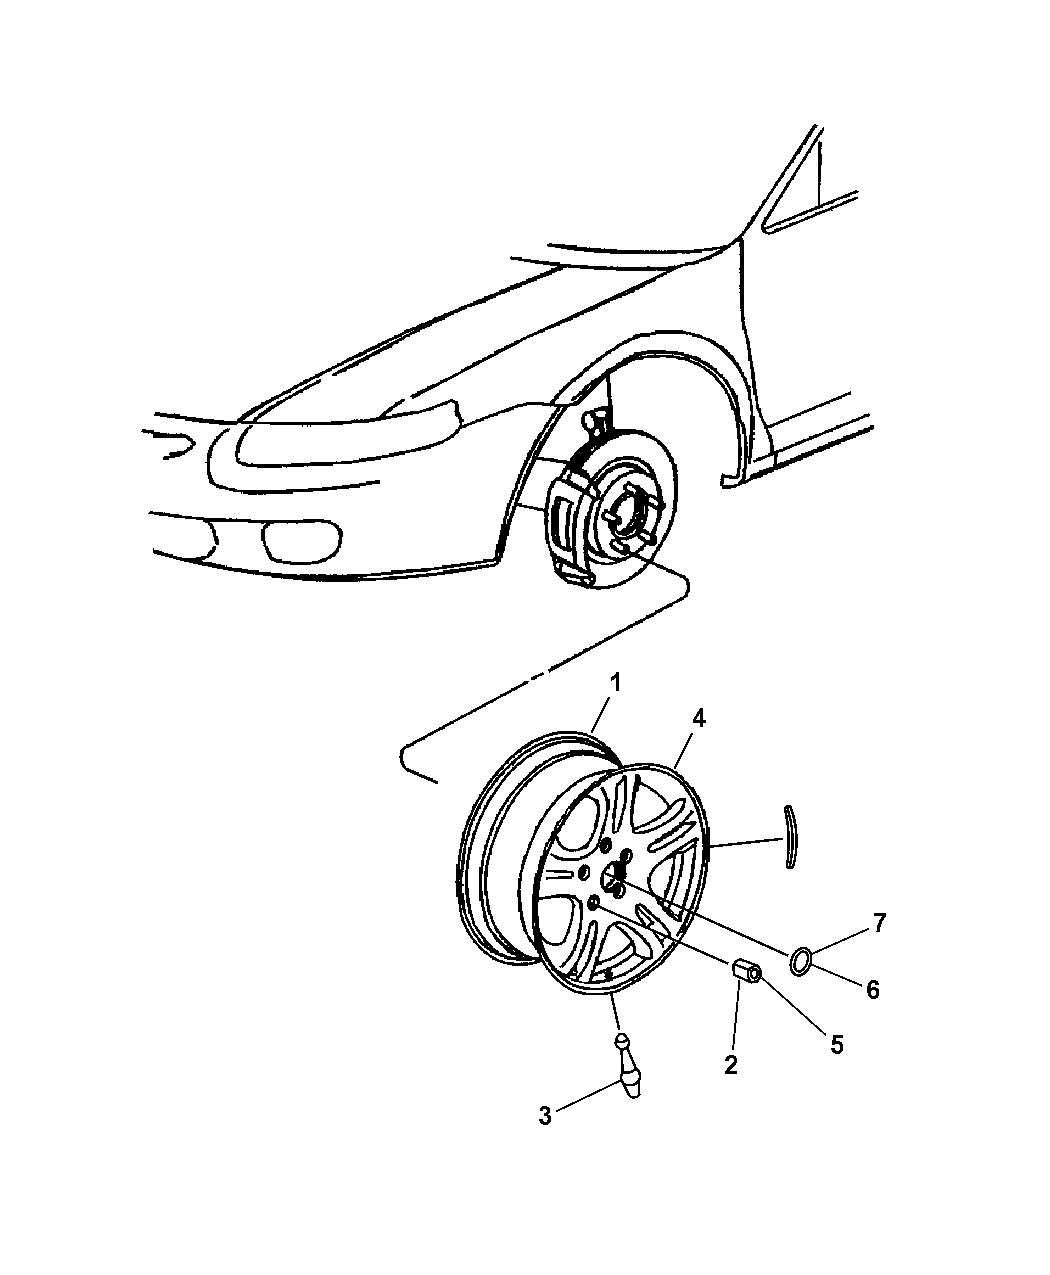 2001 Chrysler Sebring Sedan & Convertible Wheels & Hardware